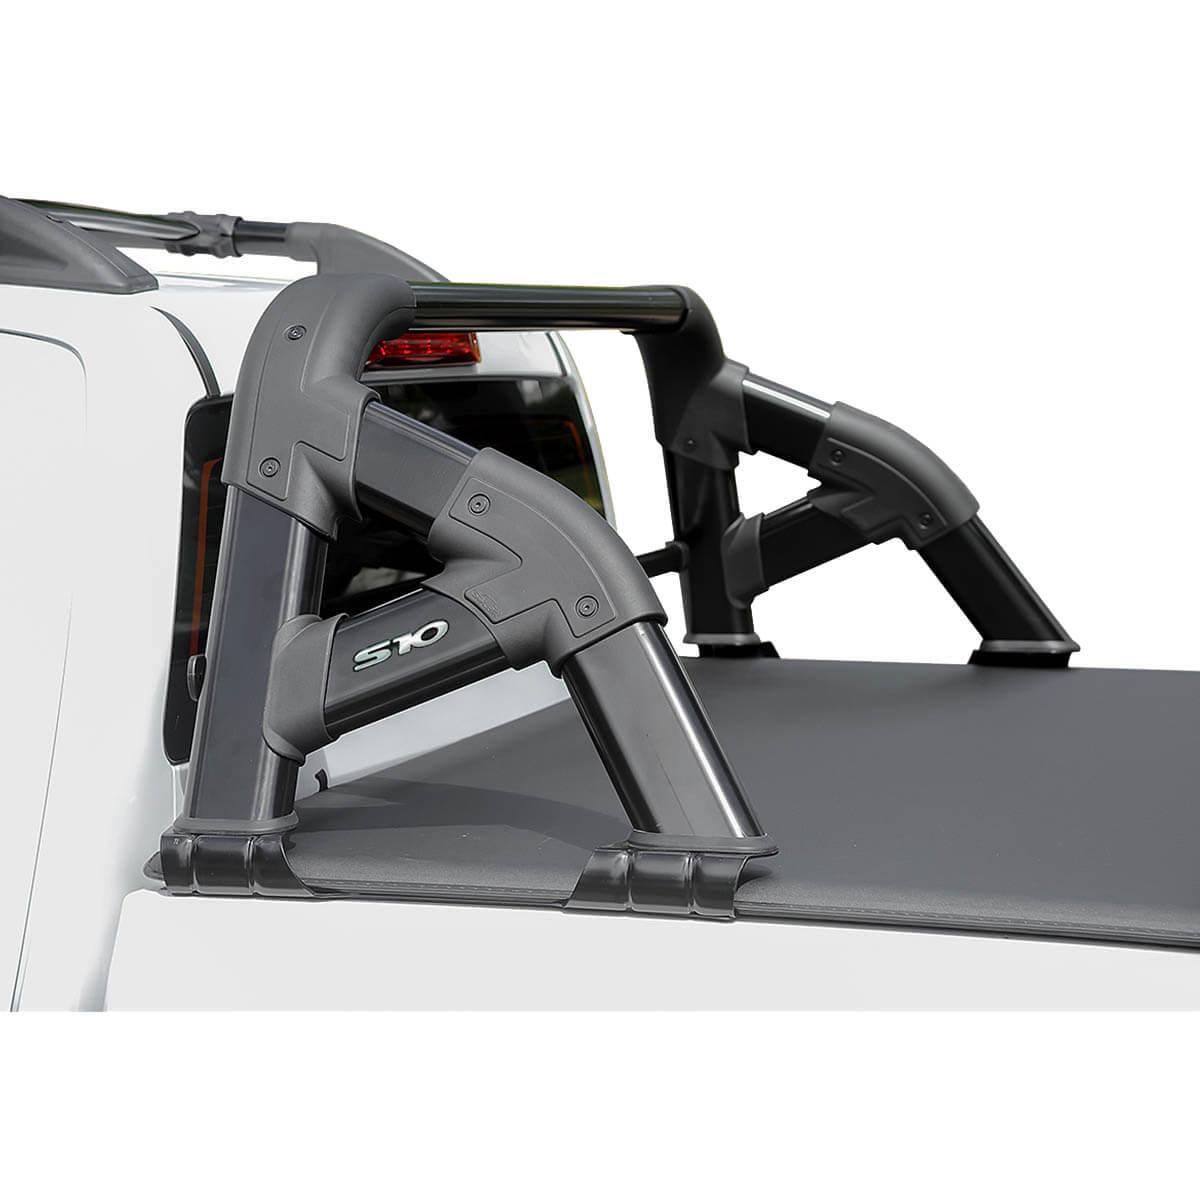 Santo antônio Solar Exclusive preto Nova S10 cabine dupla 2012 a 2022 com barra de vidro